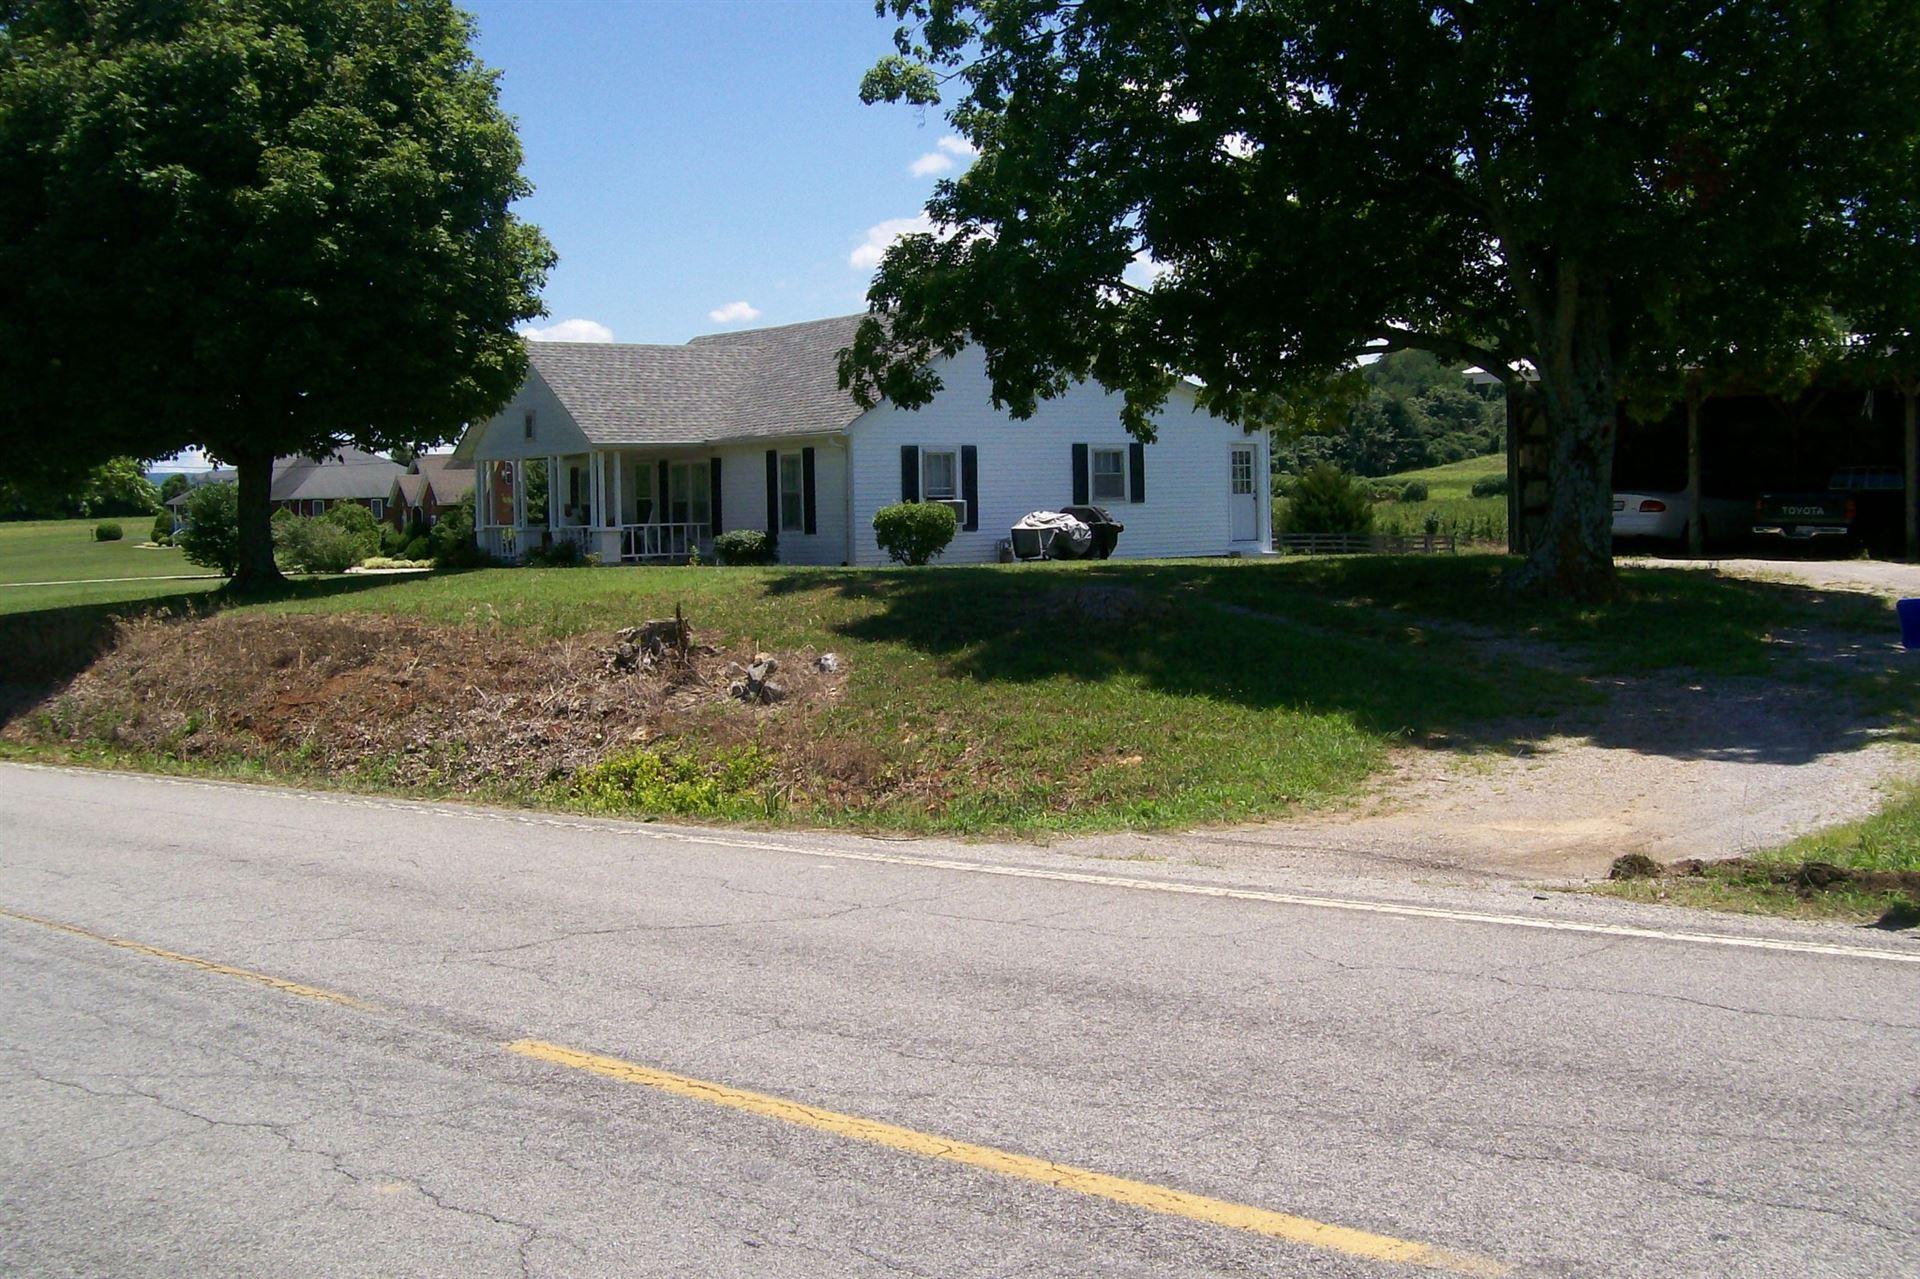 Photo of 2326 Shellsford Rd/Hwy 127, Mc Minnville, TN 37110 (MLS # 2170025)